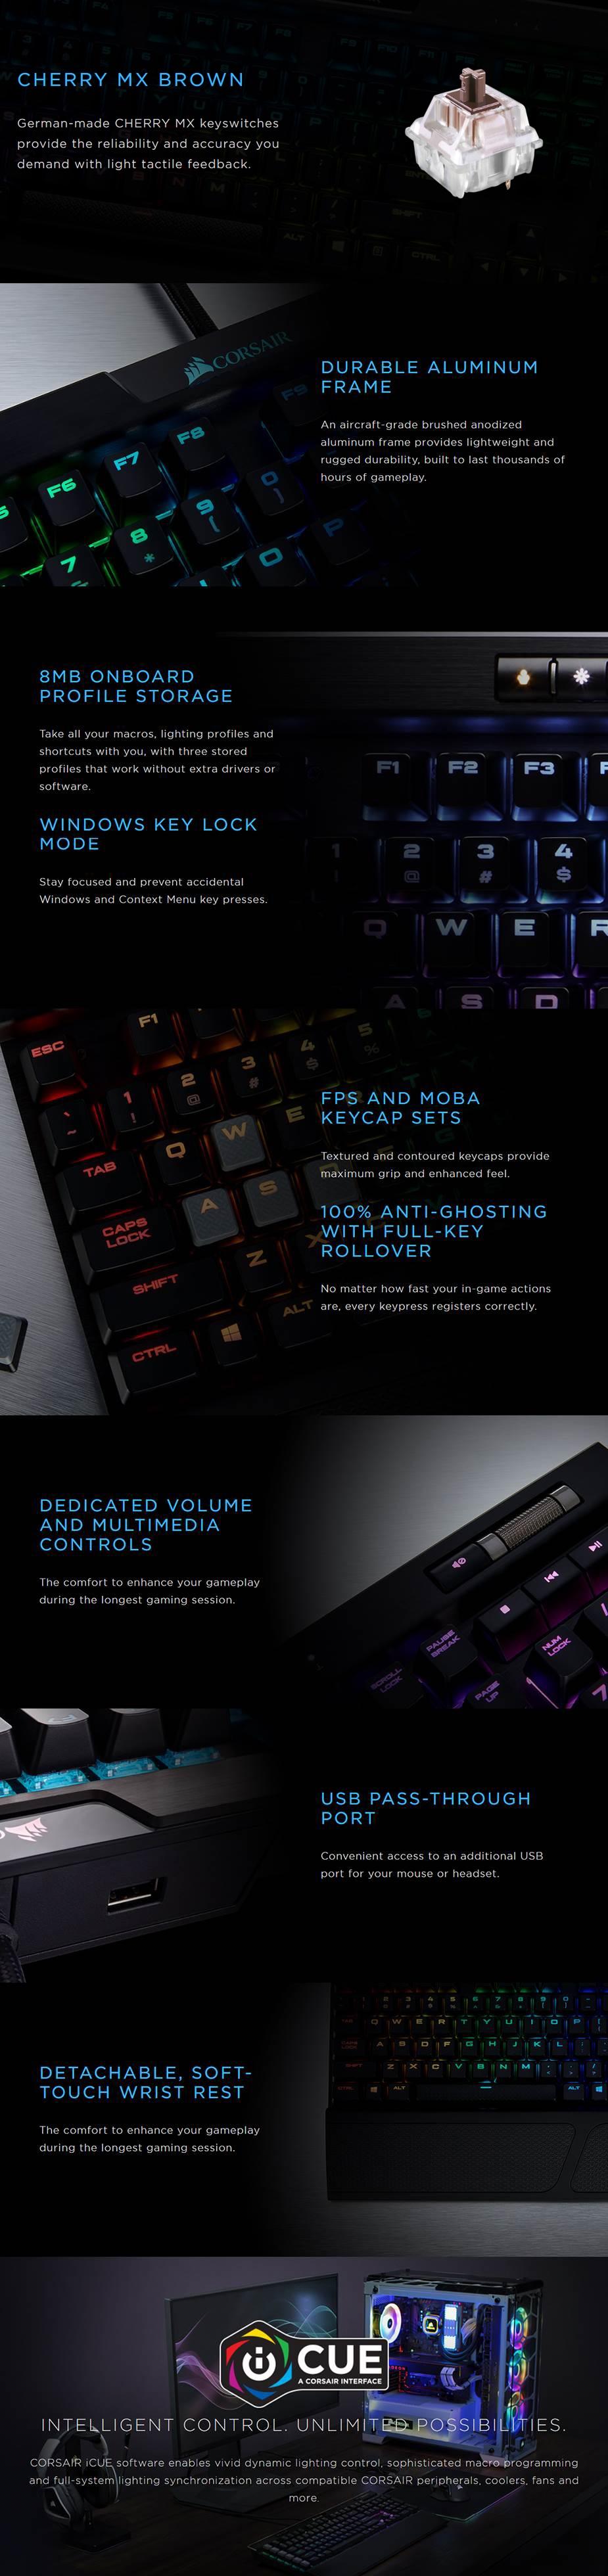 Corsair K70 RGB MK.2 Mechanical Gaming Keyboard - Cherry MX Brown - Desktop Overview 1